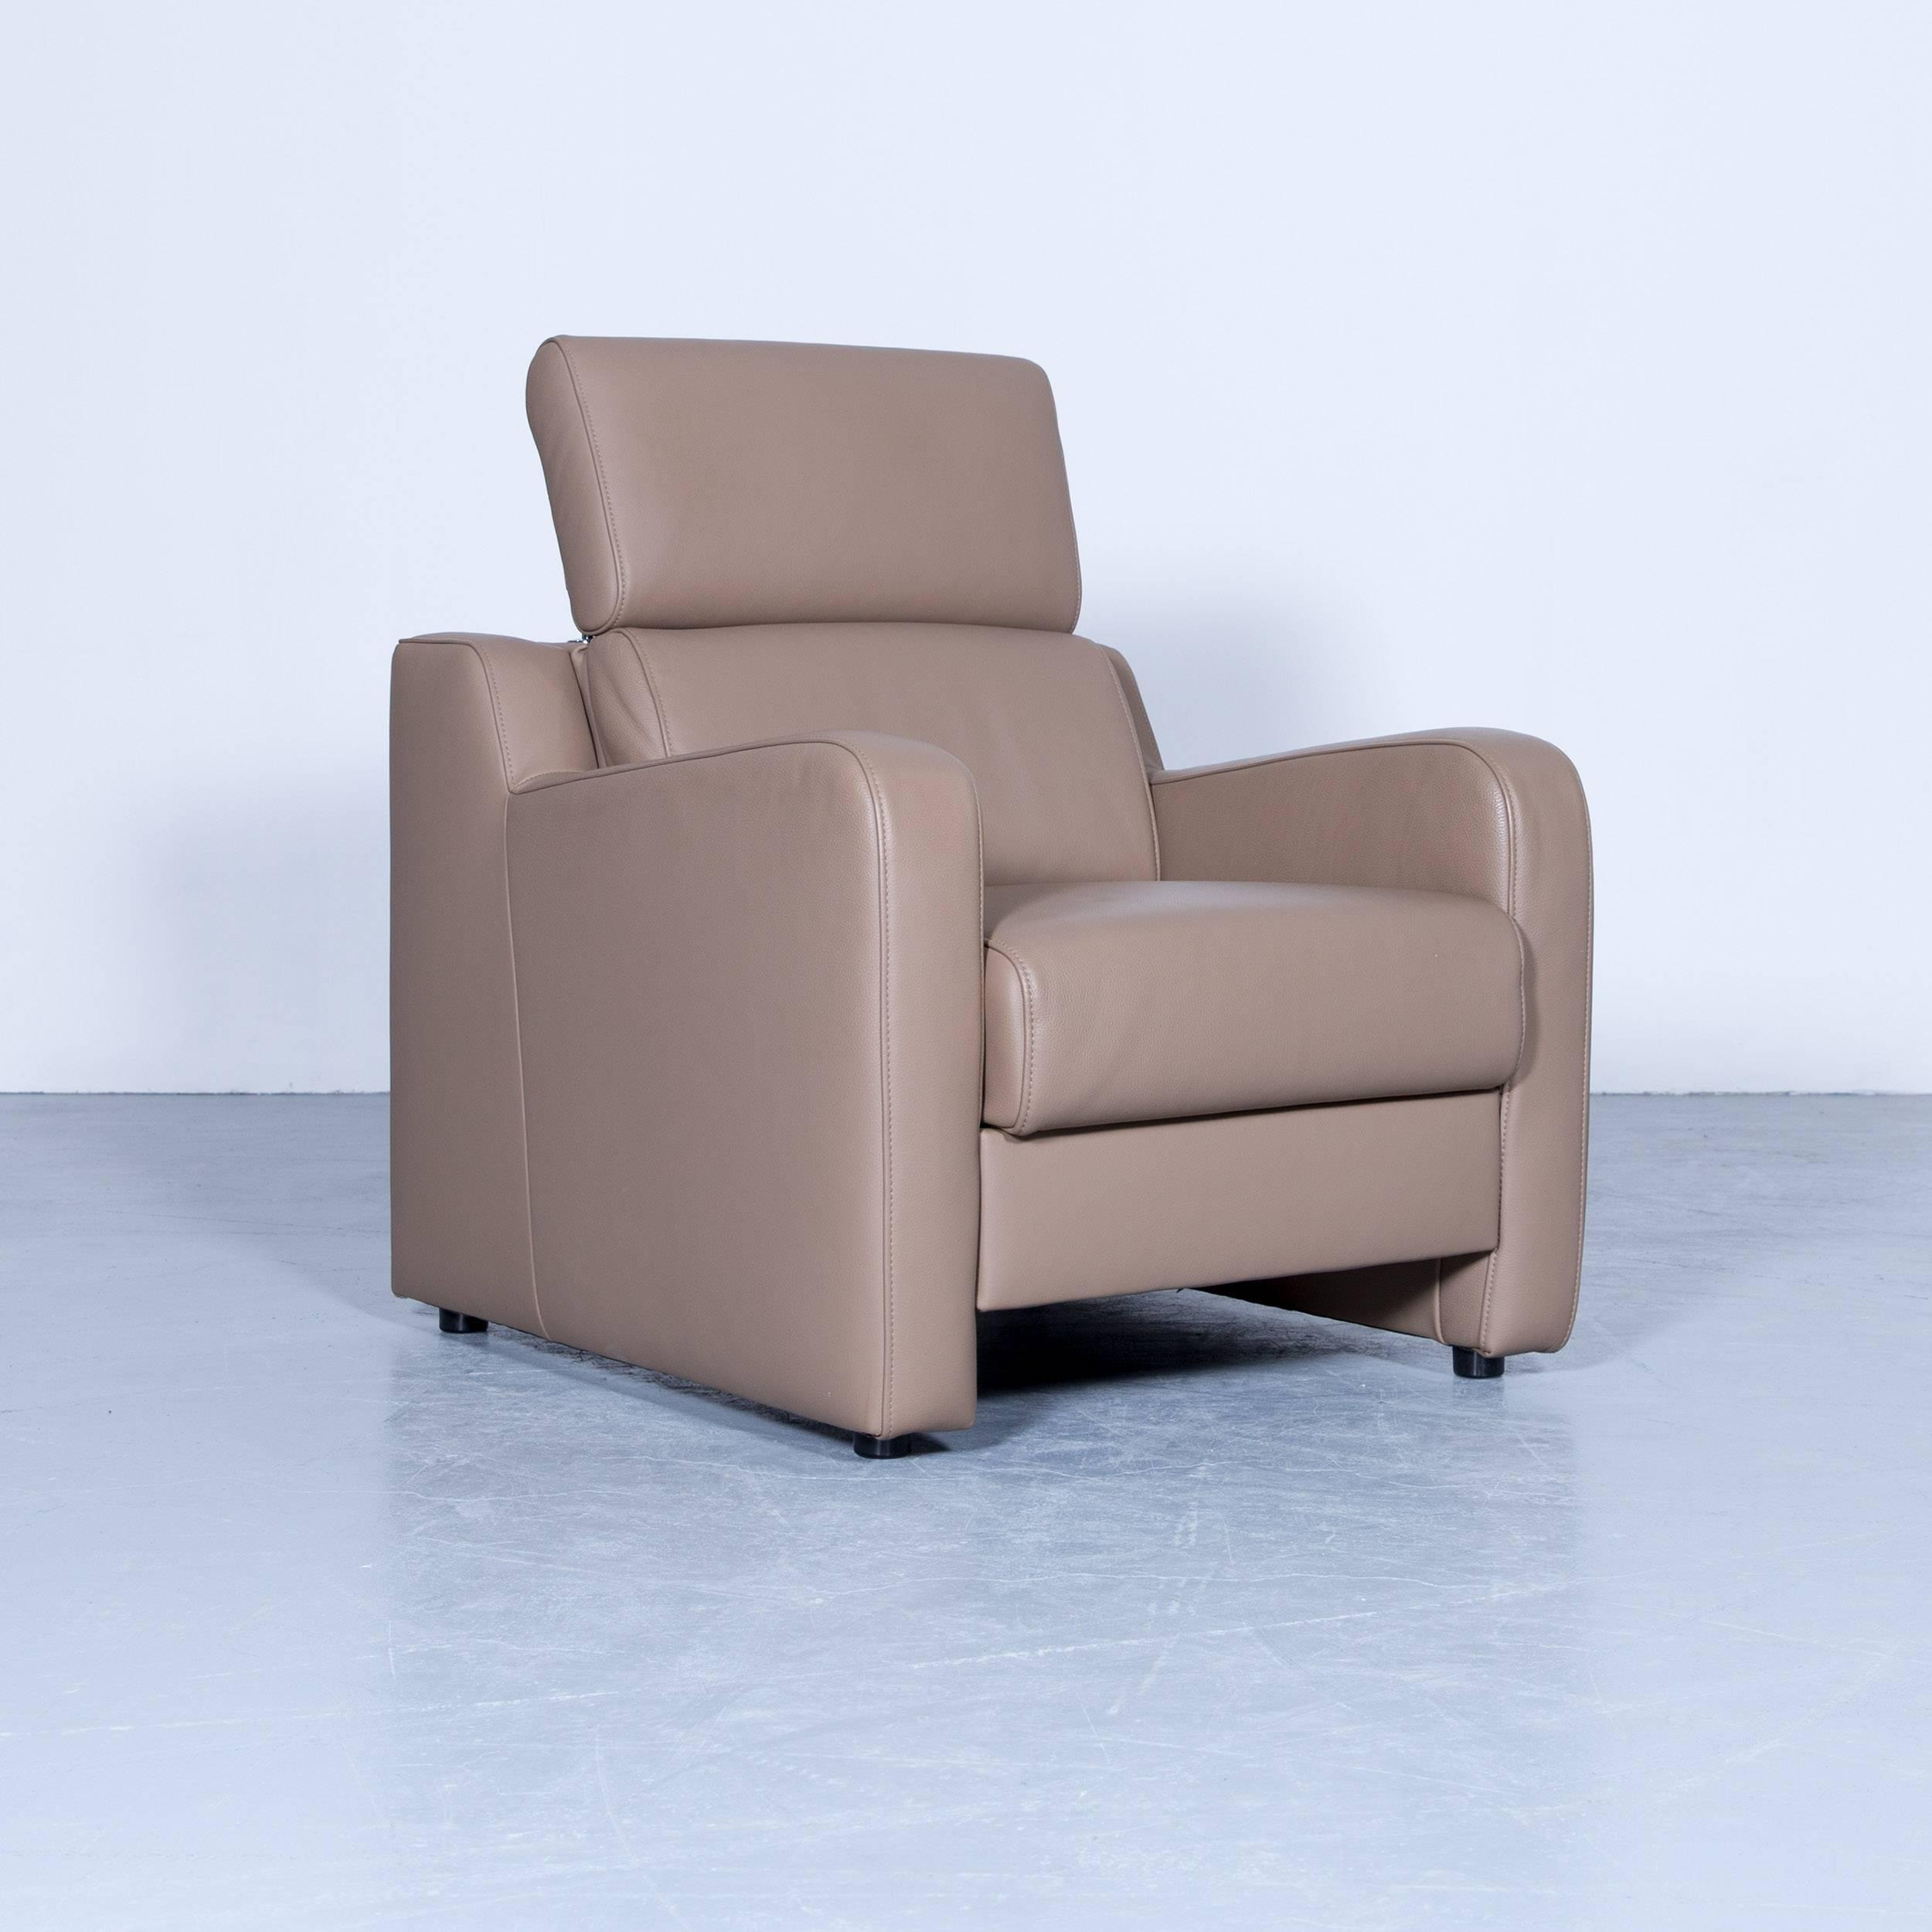 Superieur Akau0027dor Designer Sofa, Armchair, Footrest Leather Beige Brown Modern Wood  Feet For